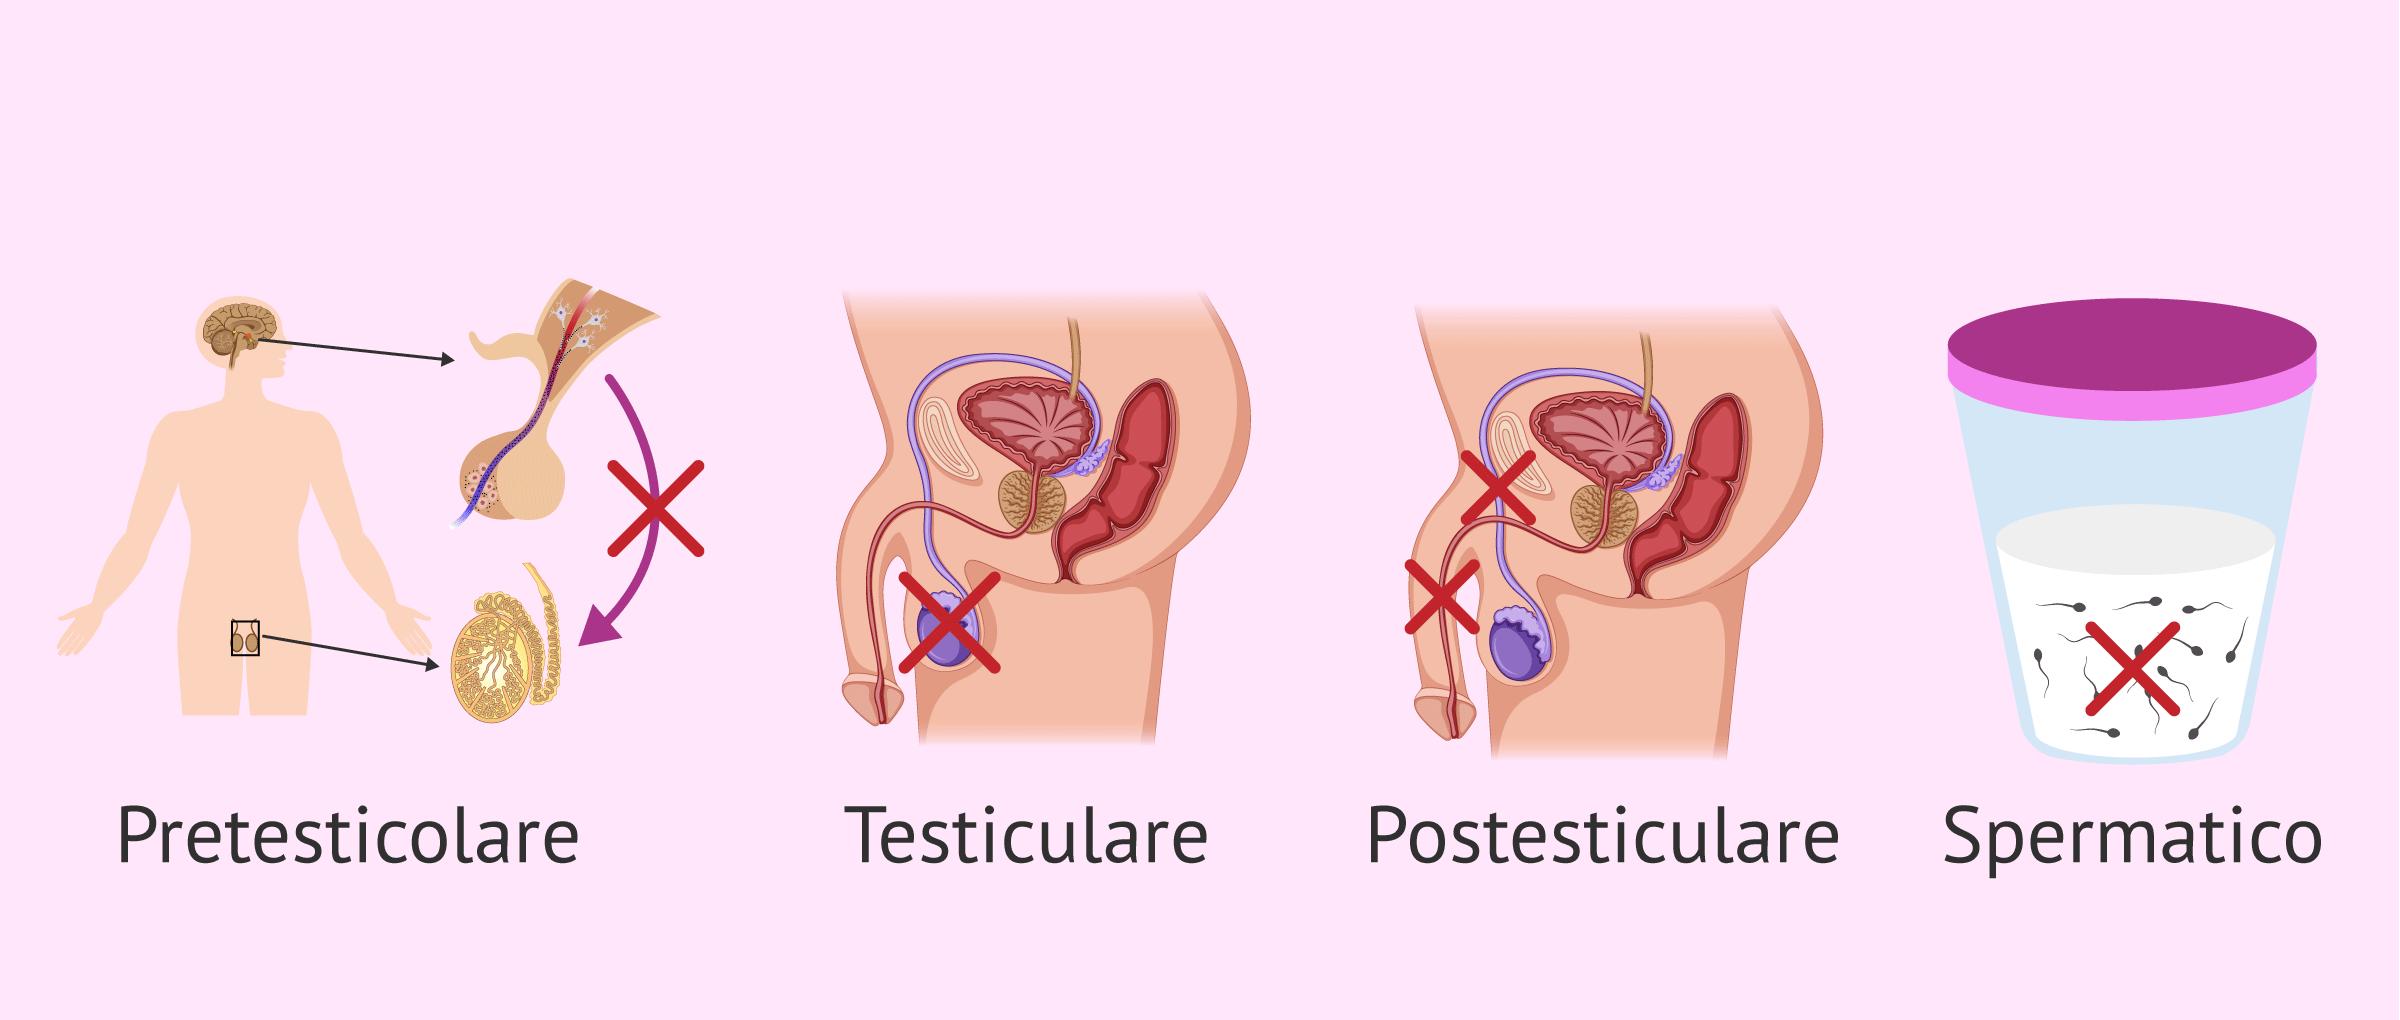 Sterilità maschile